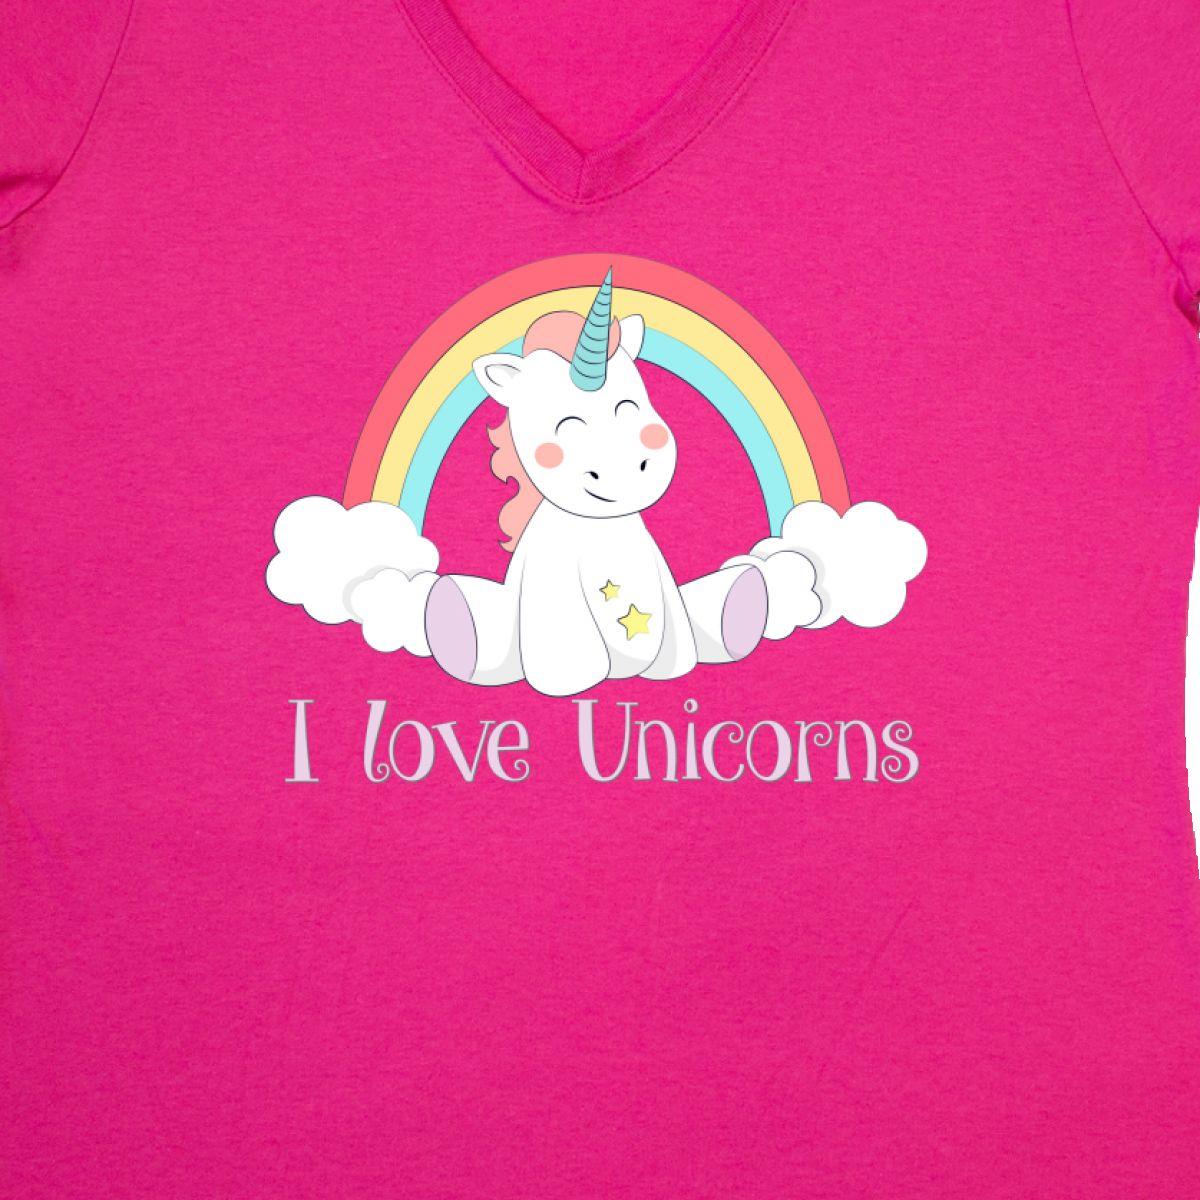 9399dd4cc27 Details about Inktastic I Love Unicorns Women s V-Neck T-Shirt Unicorn Cute  Clothing Apparel